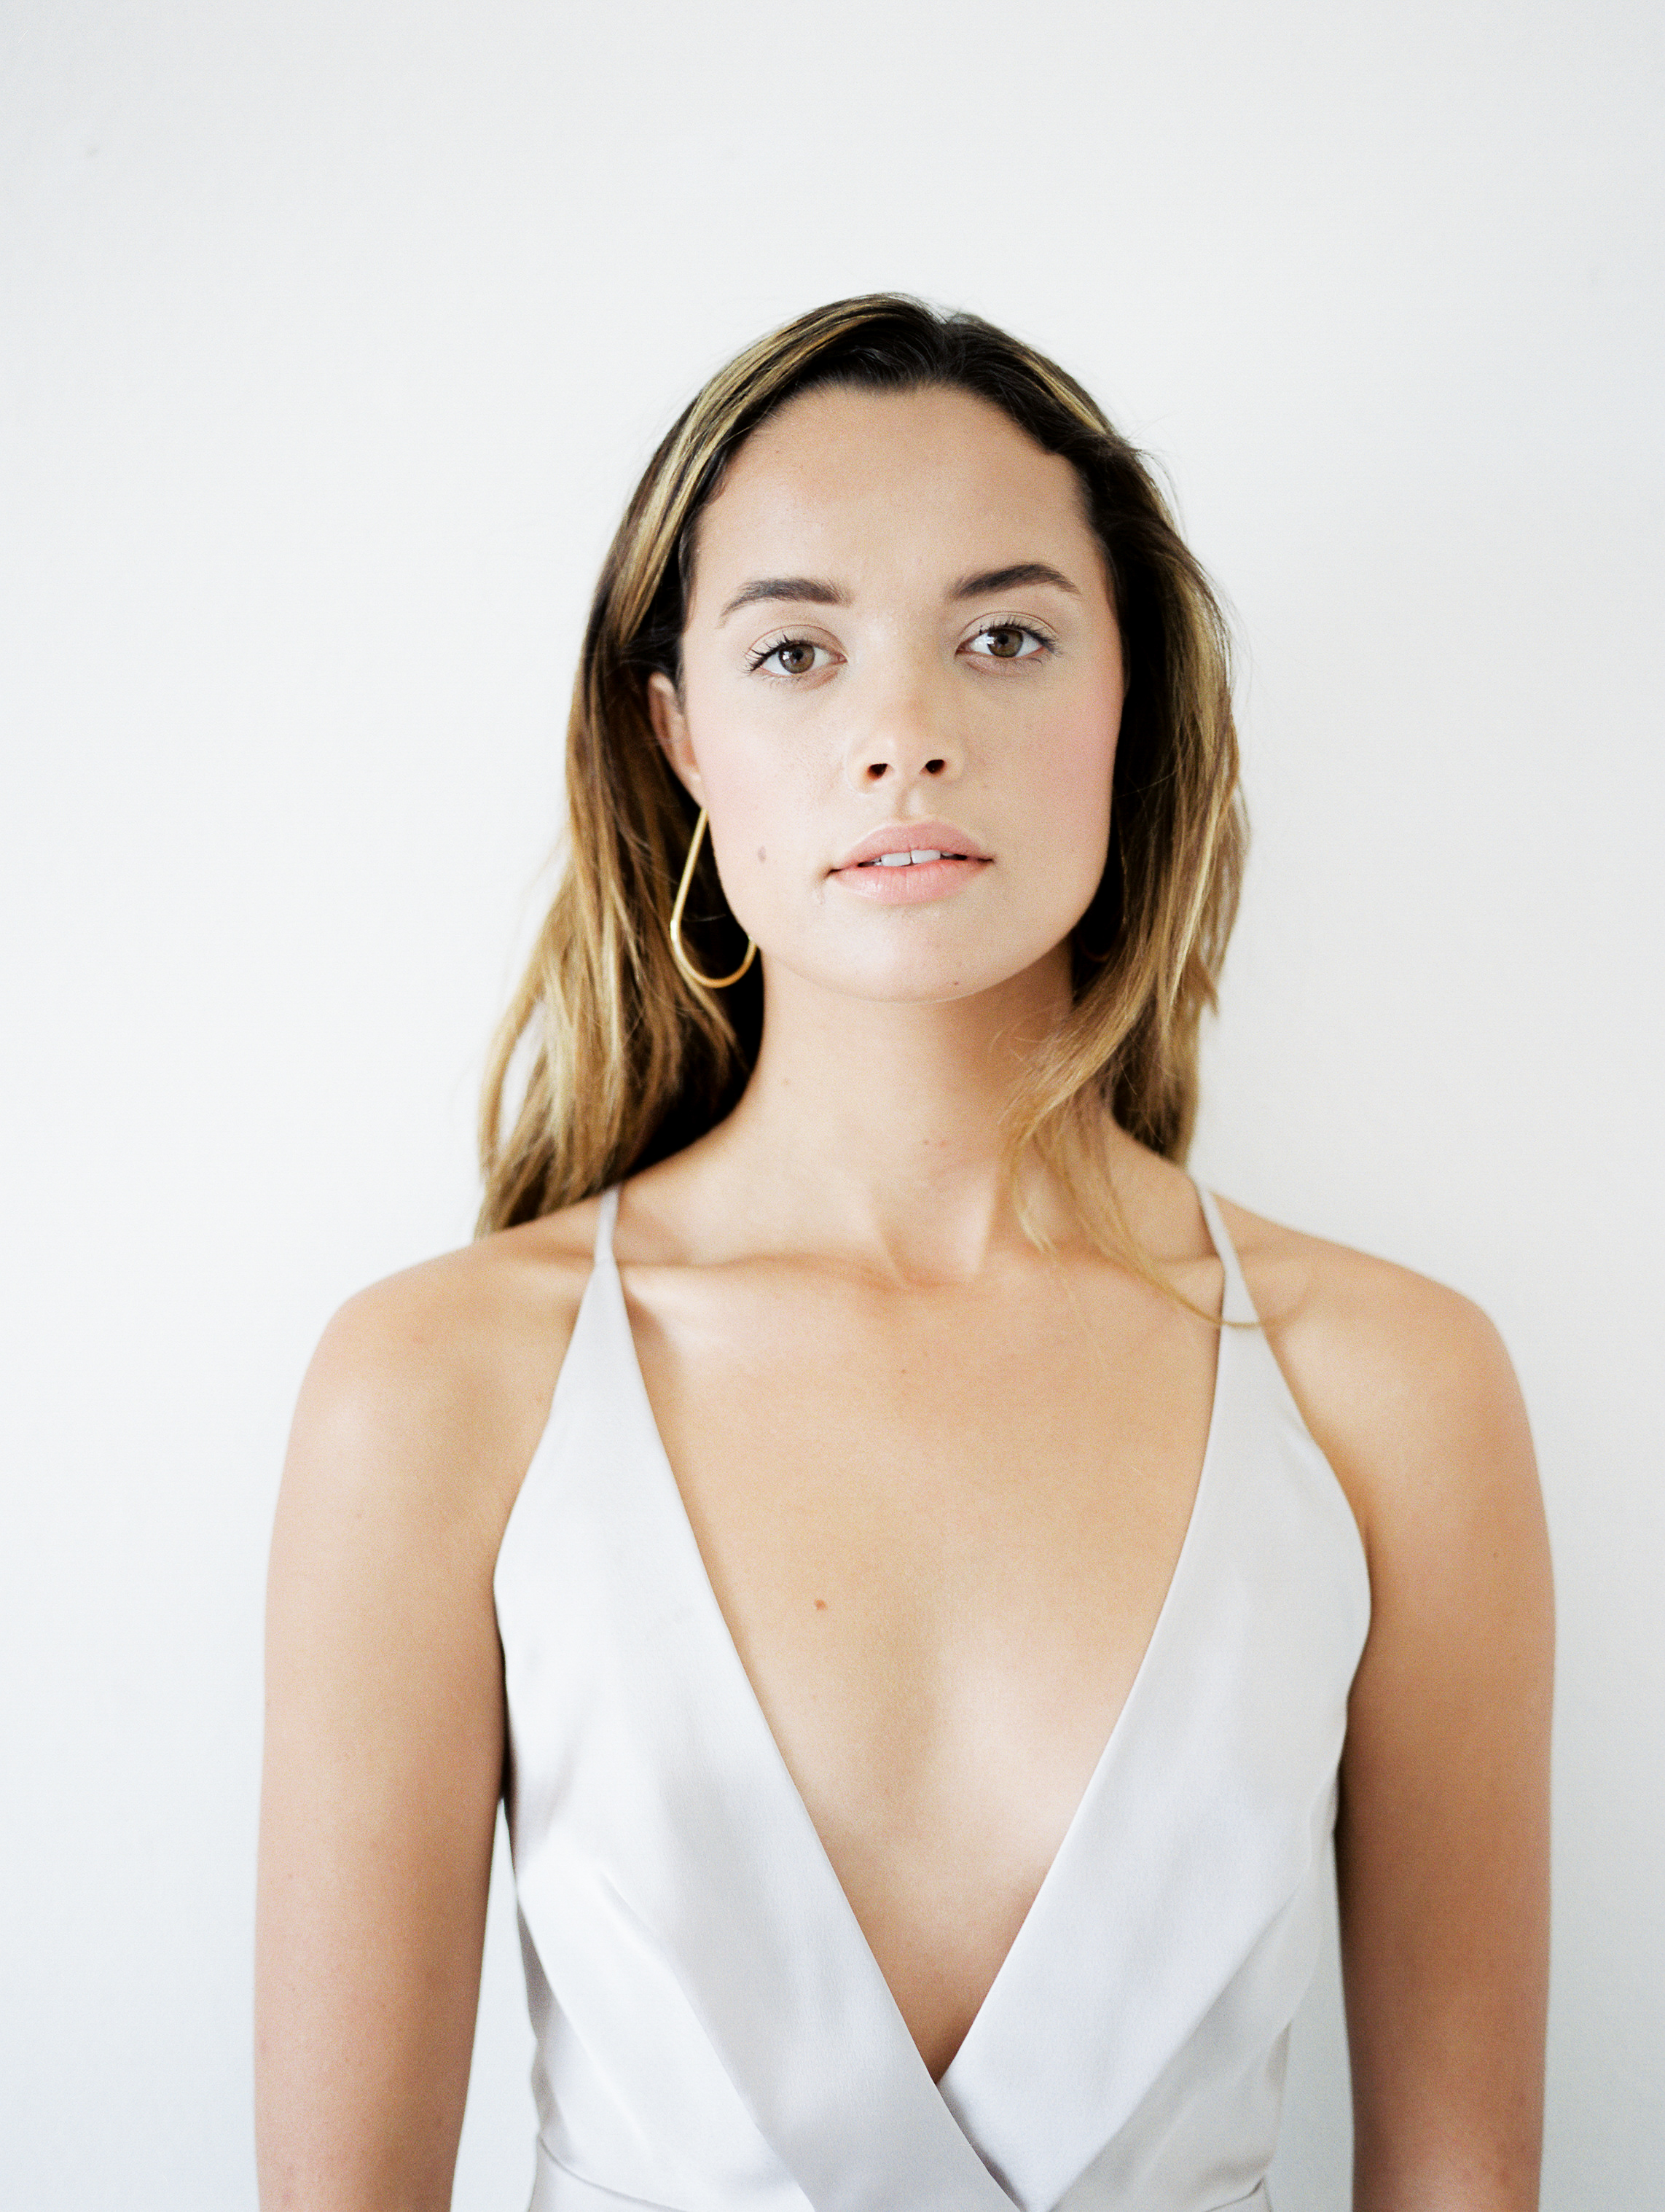 Photography: Jeremy Chou | Styling/Design: Natalie Papova | Calligraphy & Paper Goods: Spurlé Gul Studio | Model: Devon Powers | Hair & Makeup Kelly Jo